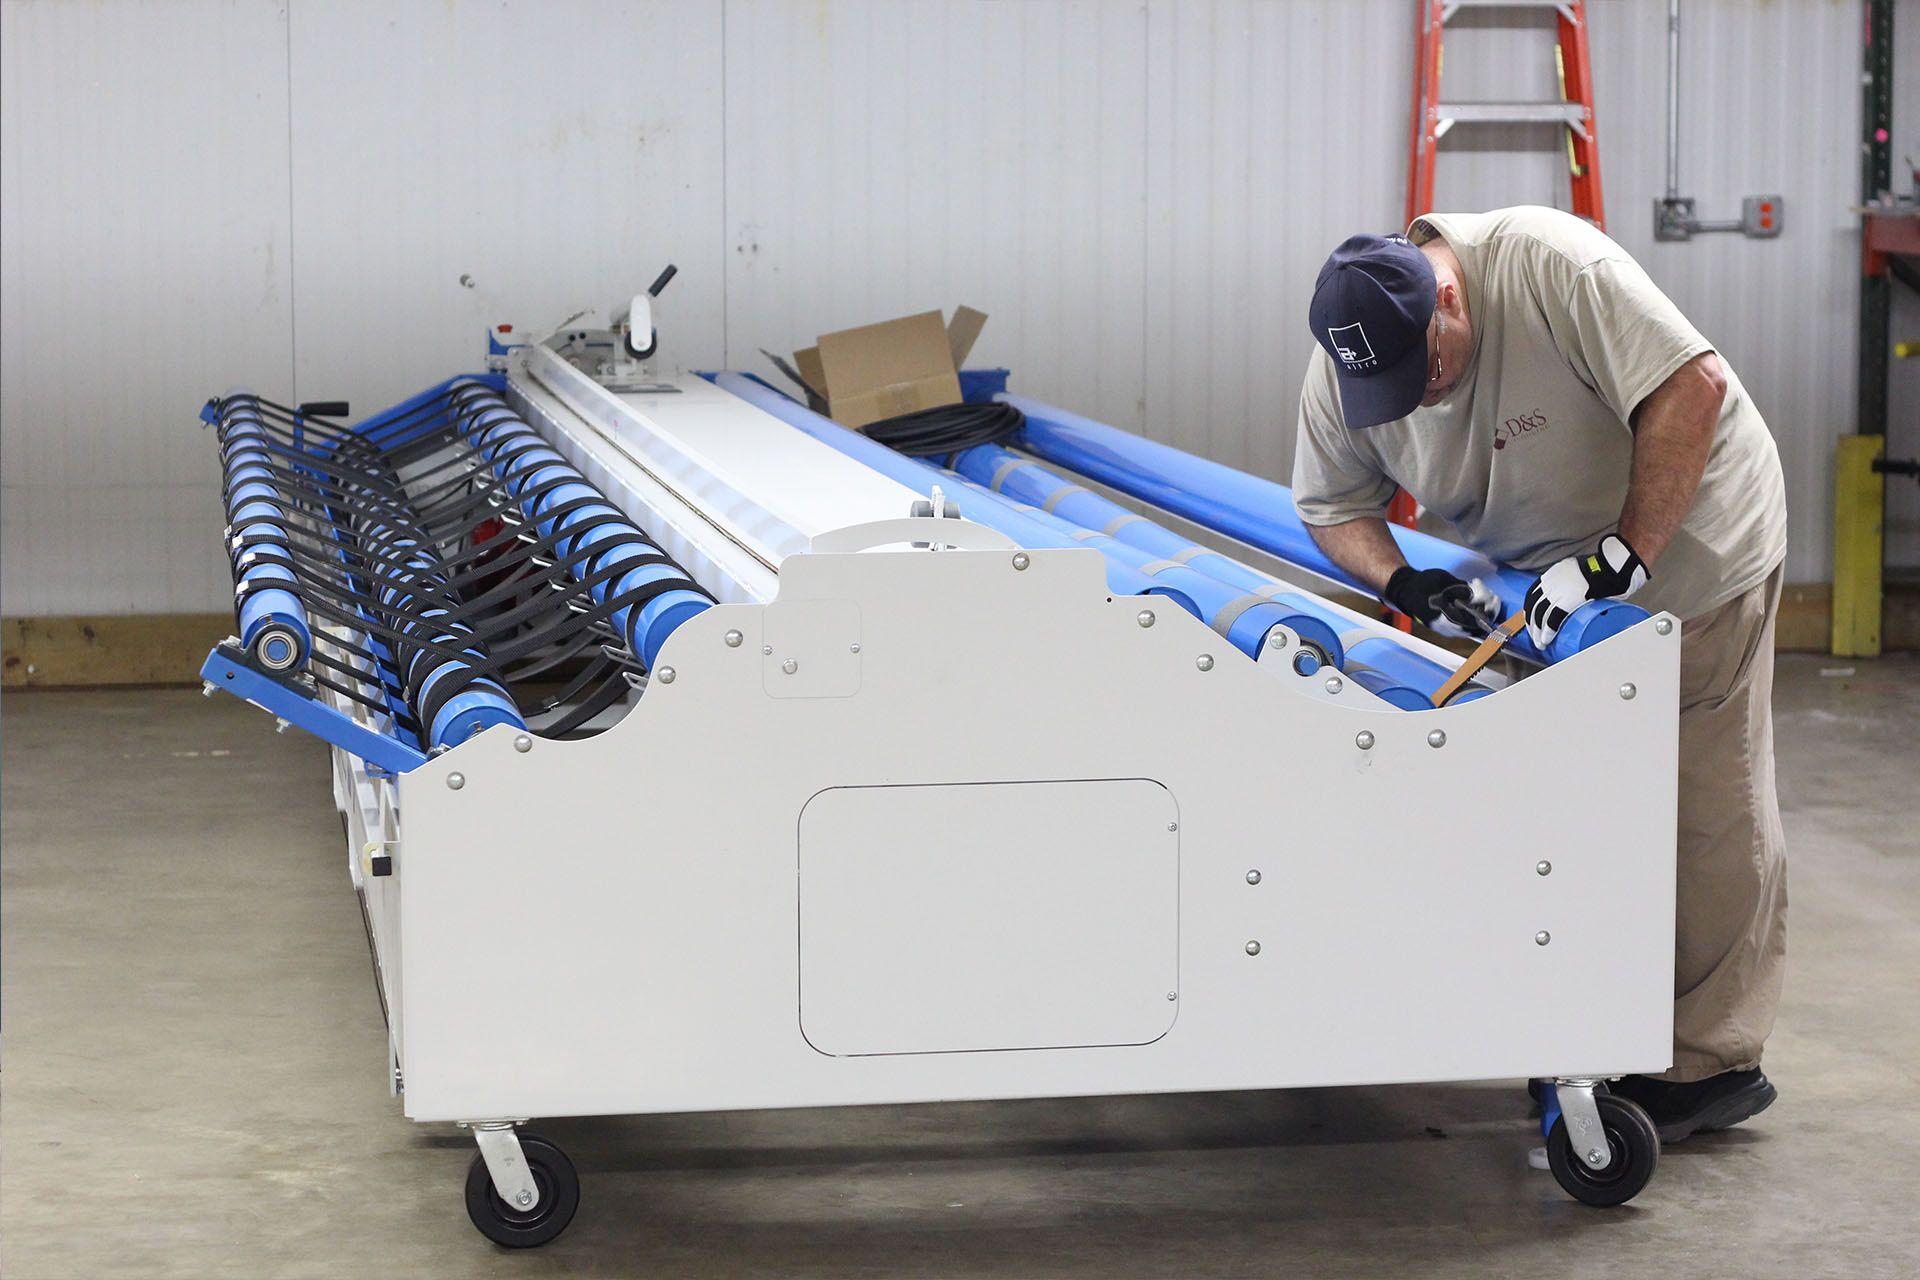 carpet-cutting-machine-warehouse-lester-miller-d-s-flooring-compressor.jpg